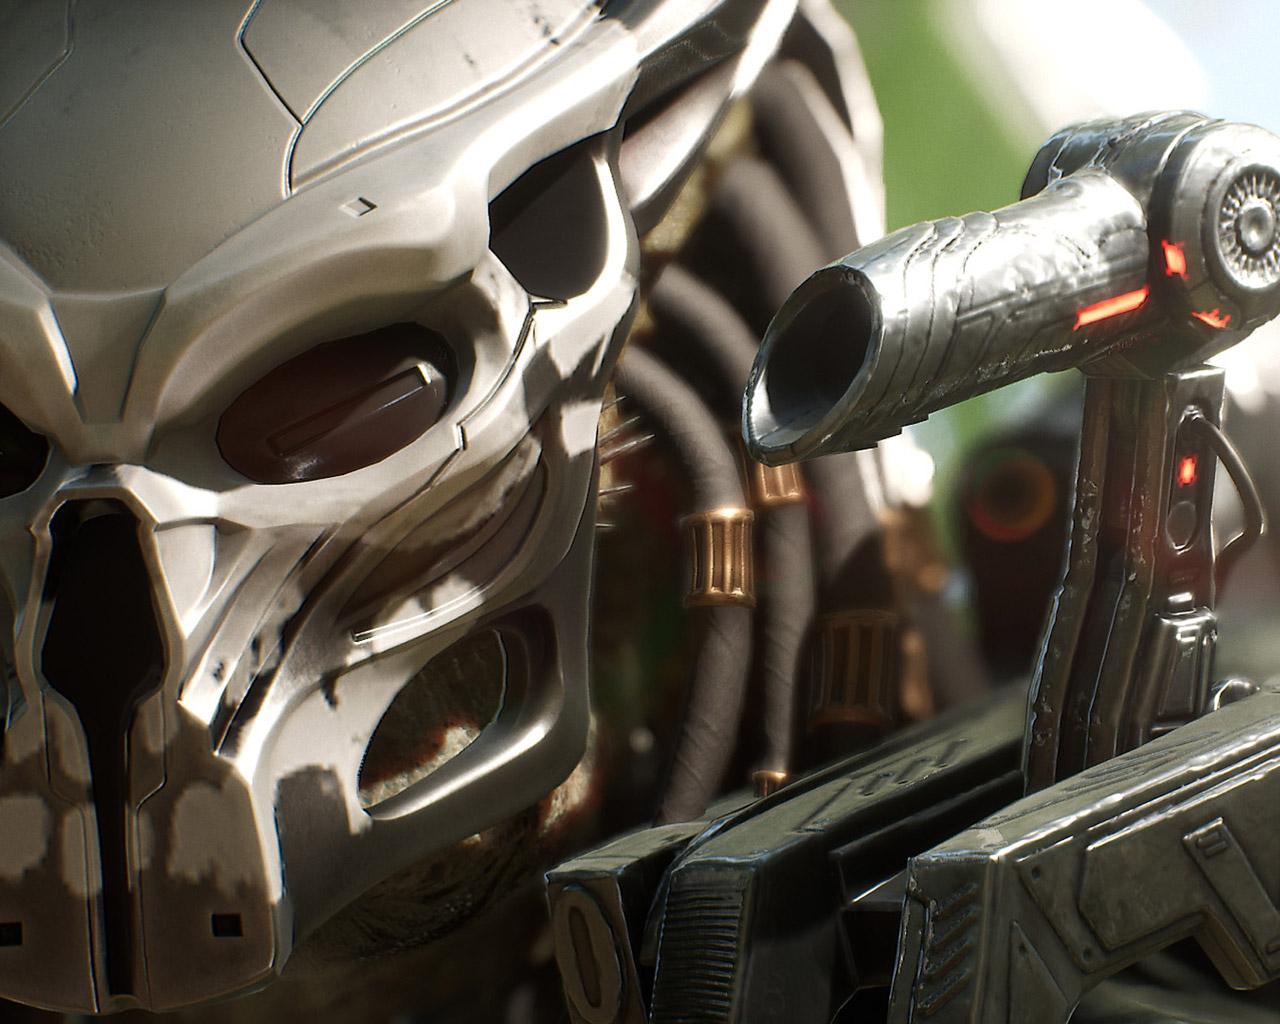 Free Predator: Hunting Grounds Wallpaper in 1280x1024